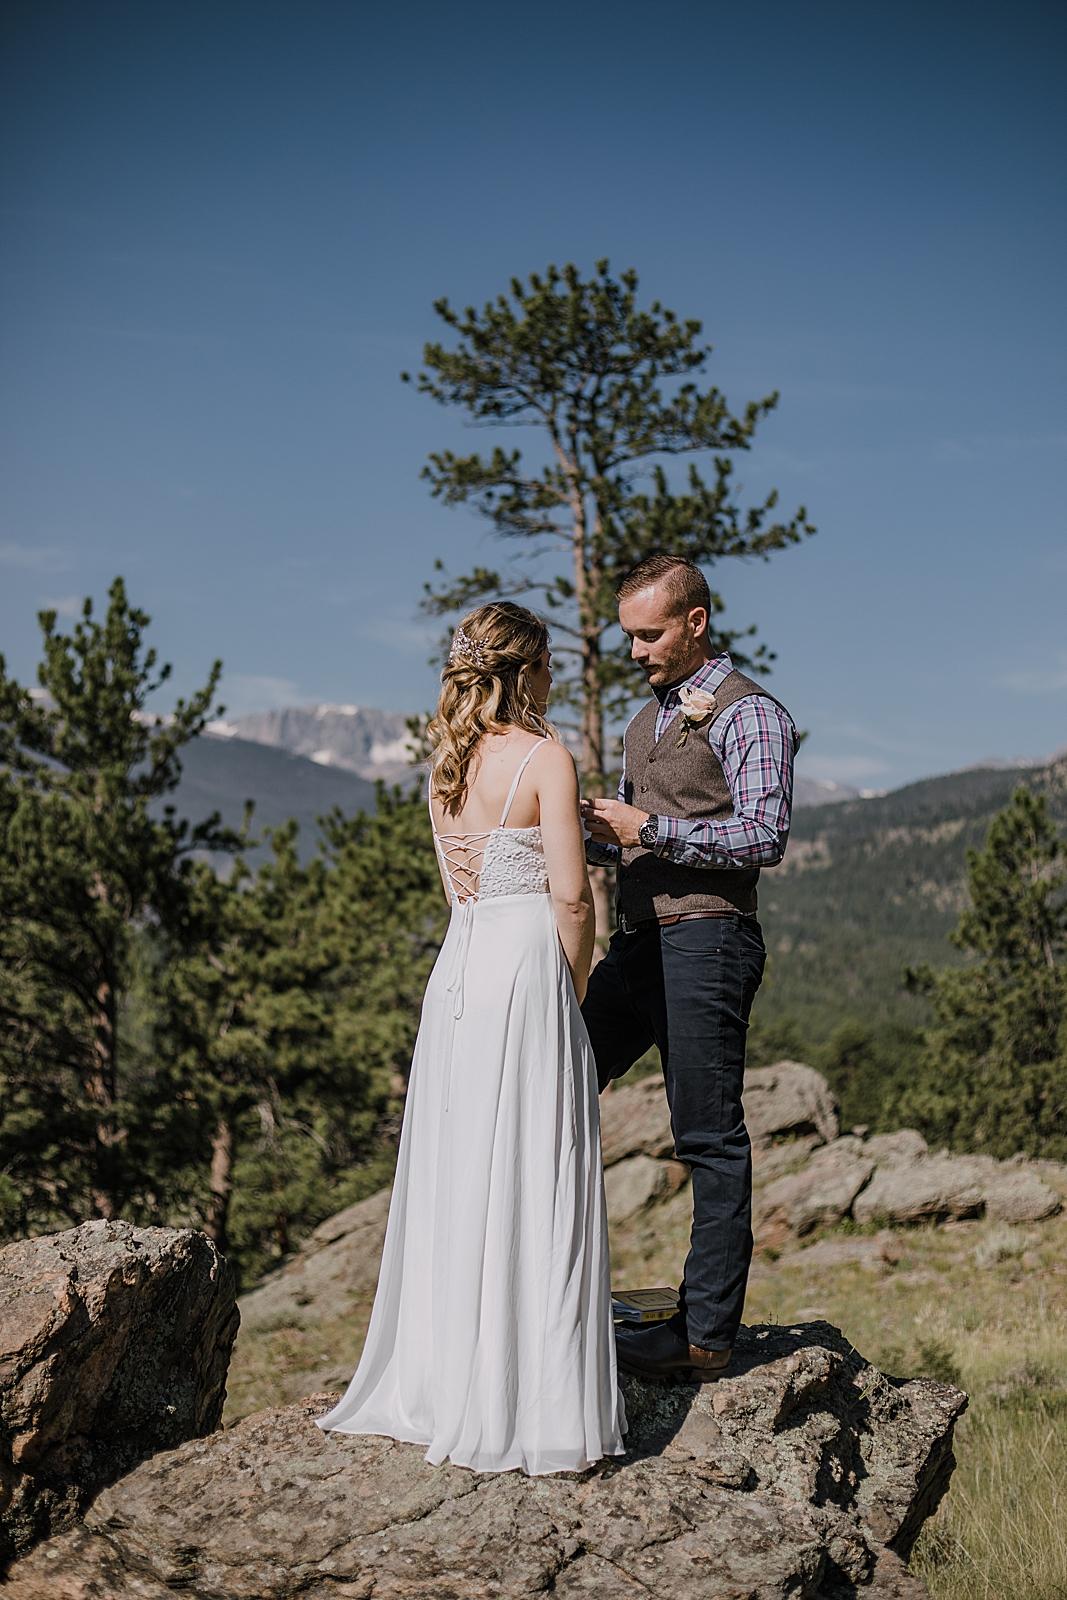 elopement ceremony, rocky mountain national park elopement, 3M curves elopement, self solemnizing, self solemnization, long's peak ceremony, hiking elopement, estes park elopement